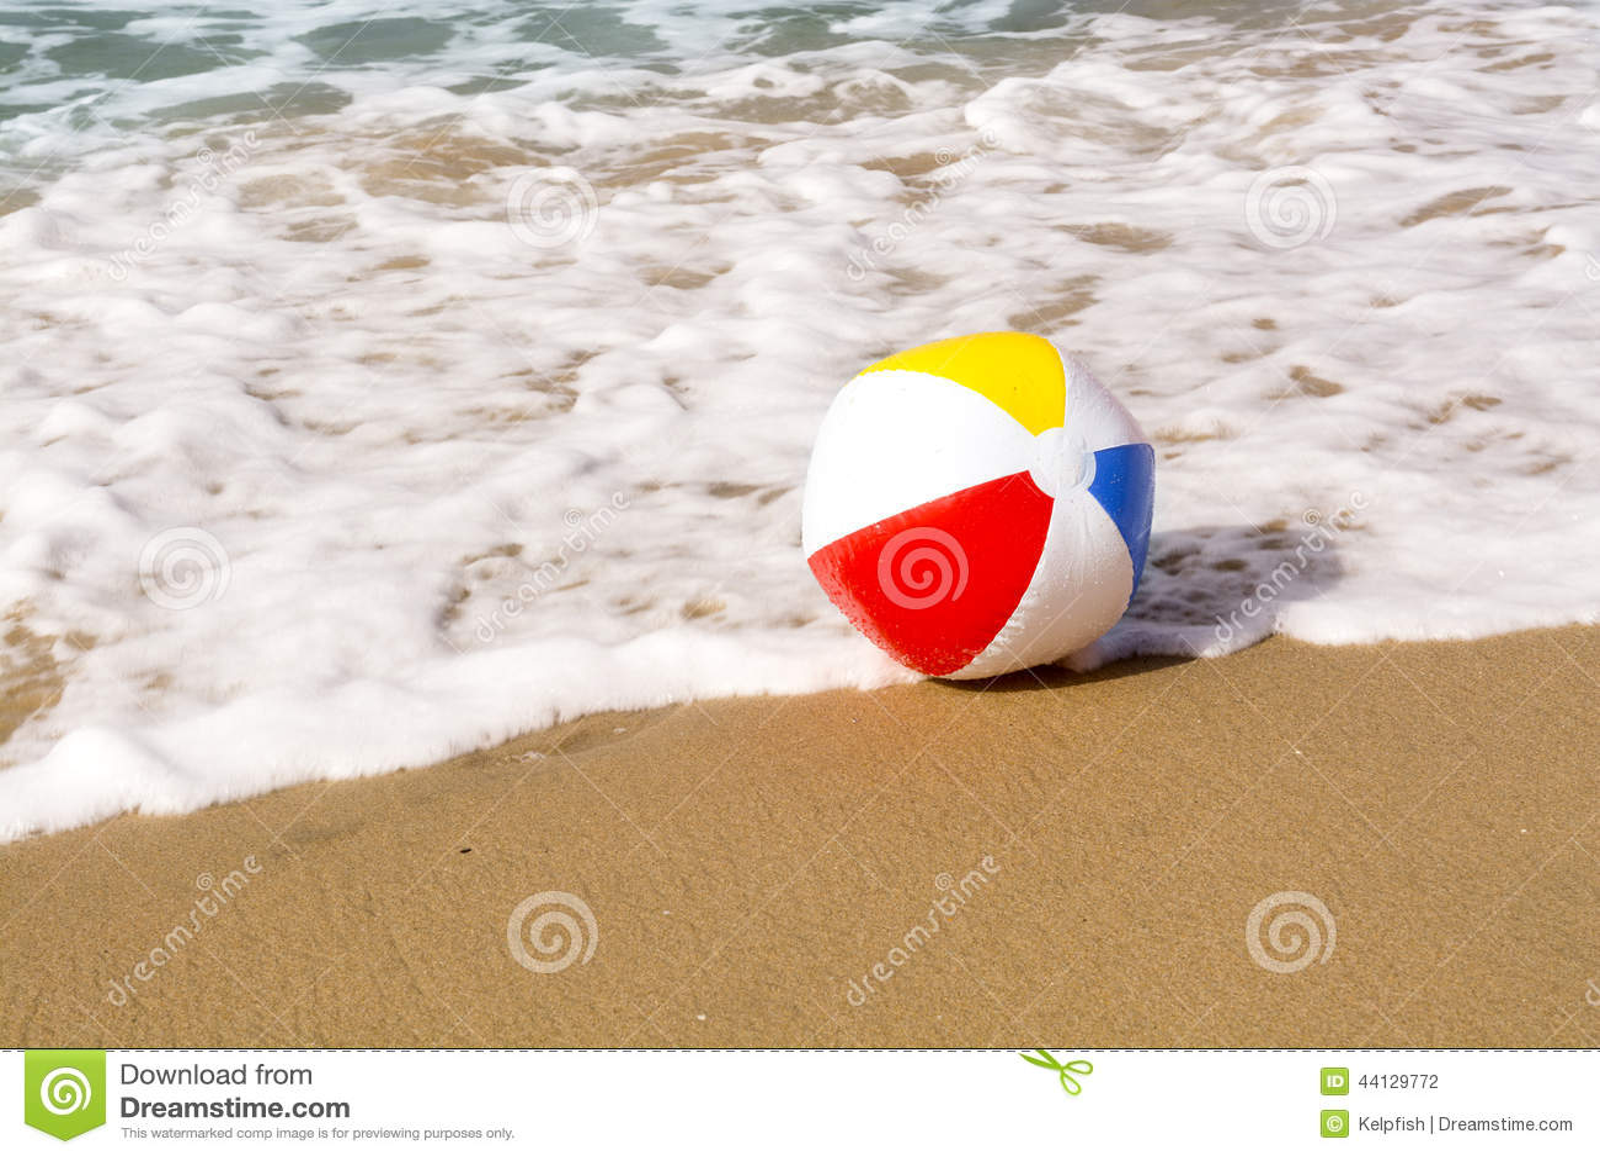 Beach ball in sand Clip Art Beach Ball On Sand Shutterstock Beach Ball On Sand Stock Photo Image Of Beach Surf 44129772